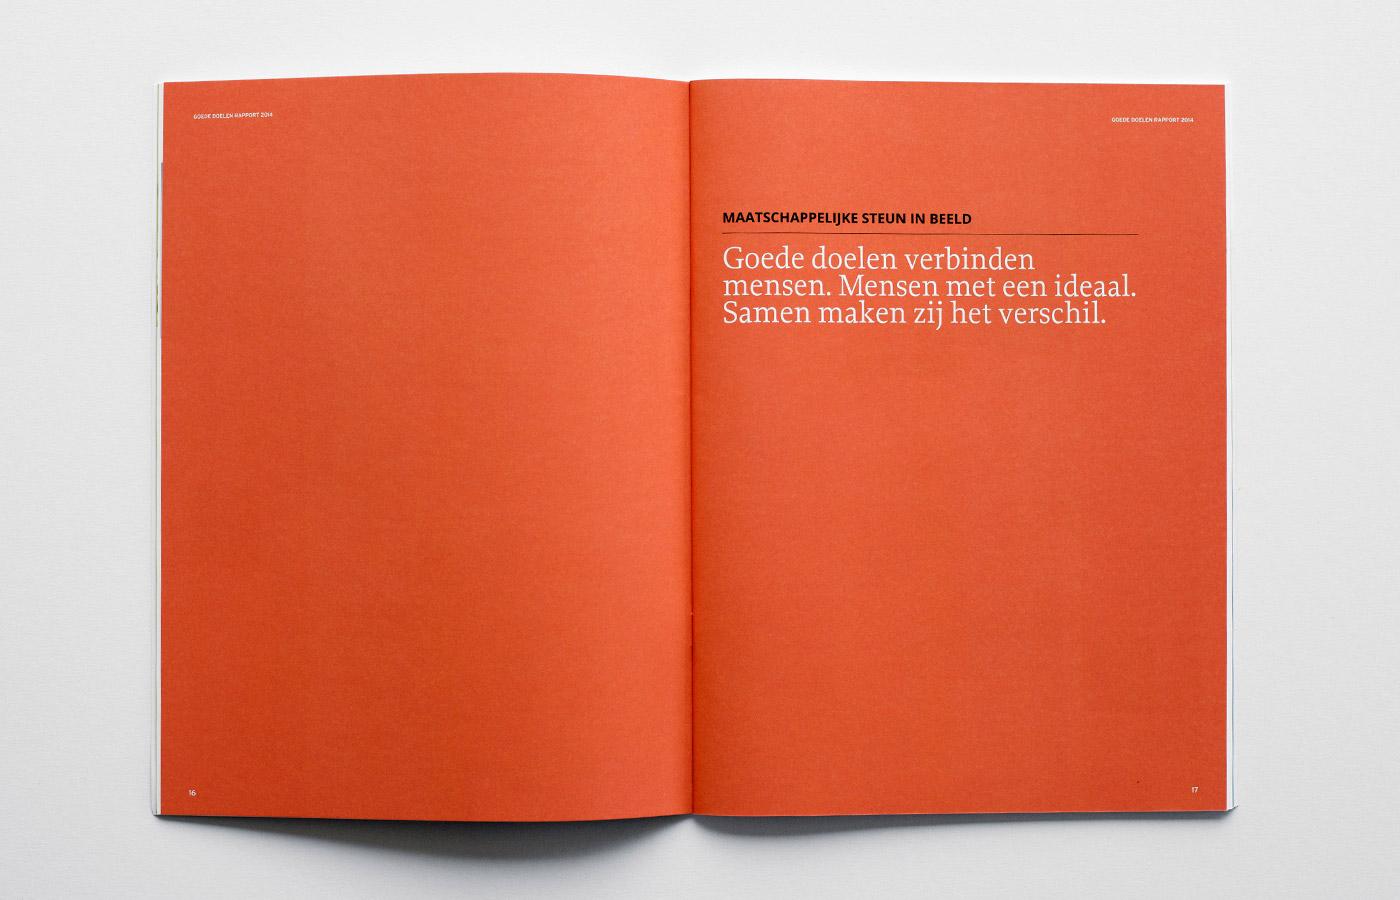 binnenkant 2 rapport goede doelen Nederland